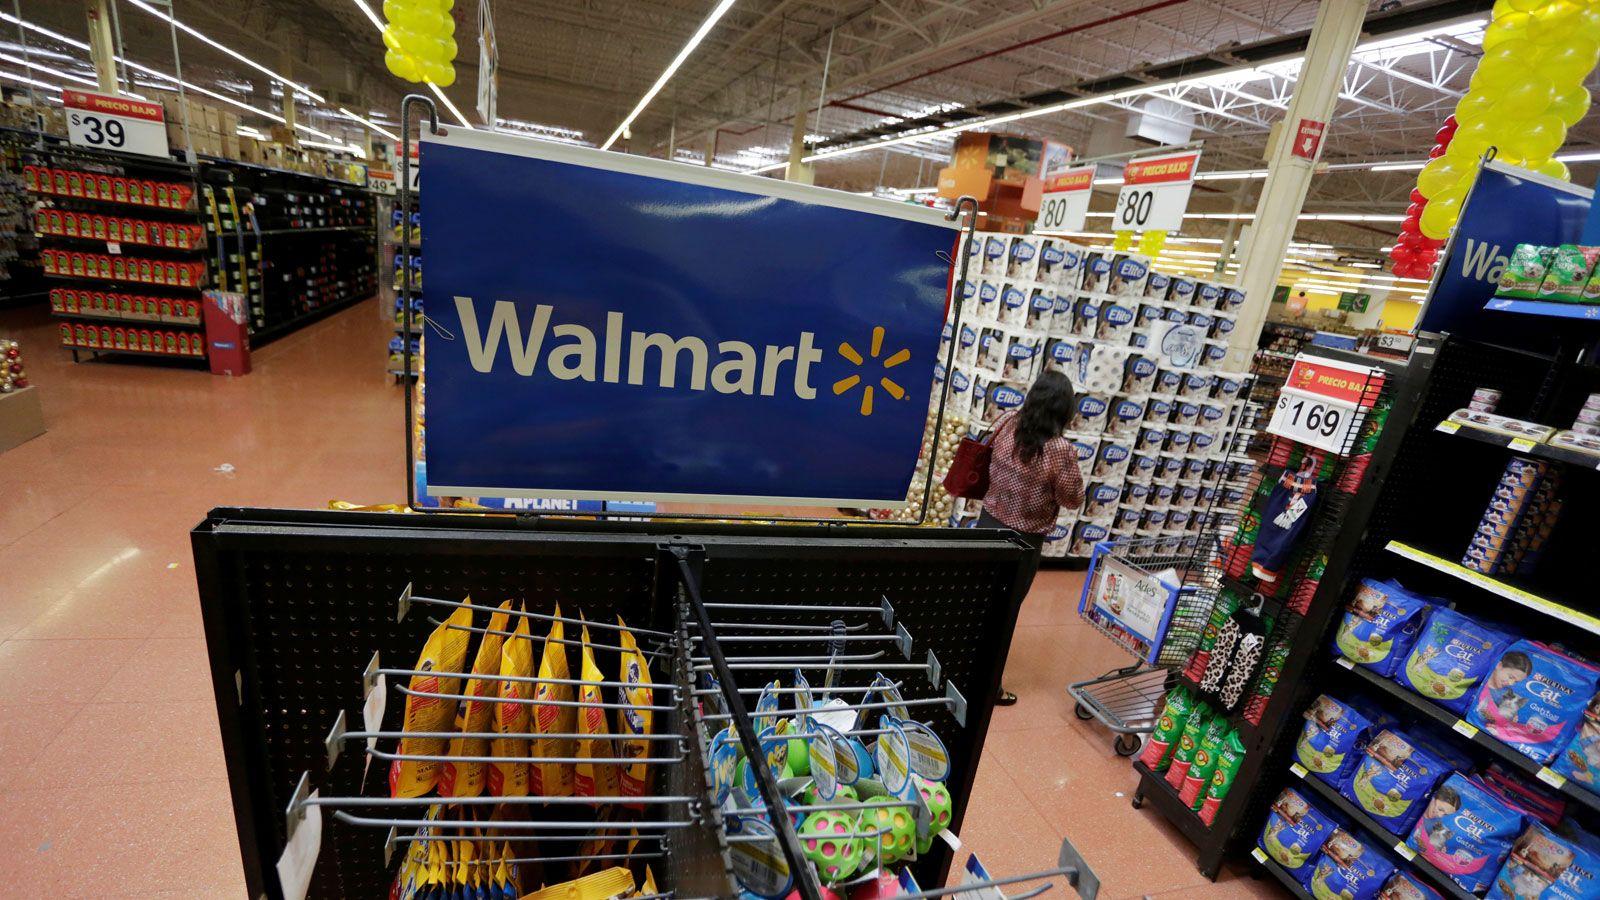 Walmart Vs Amazon Whos Scared Now Walmart Inc Nysewmt